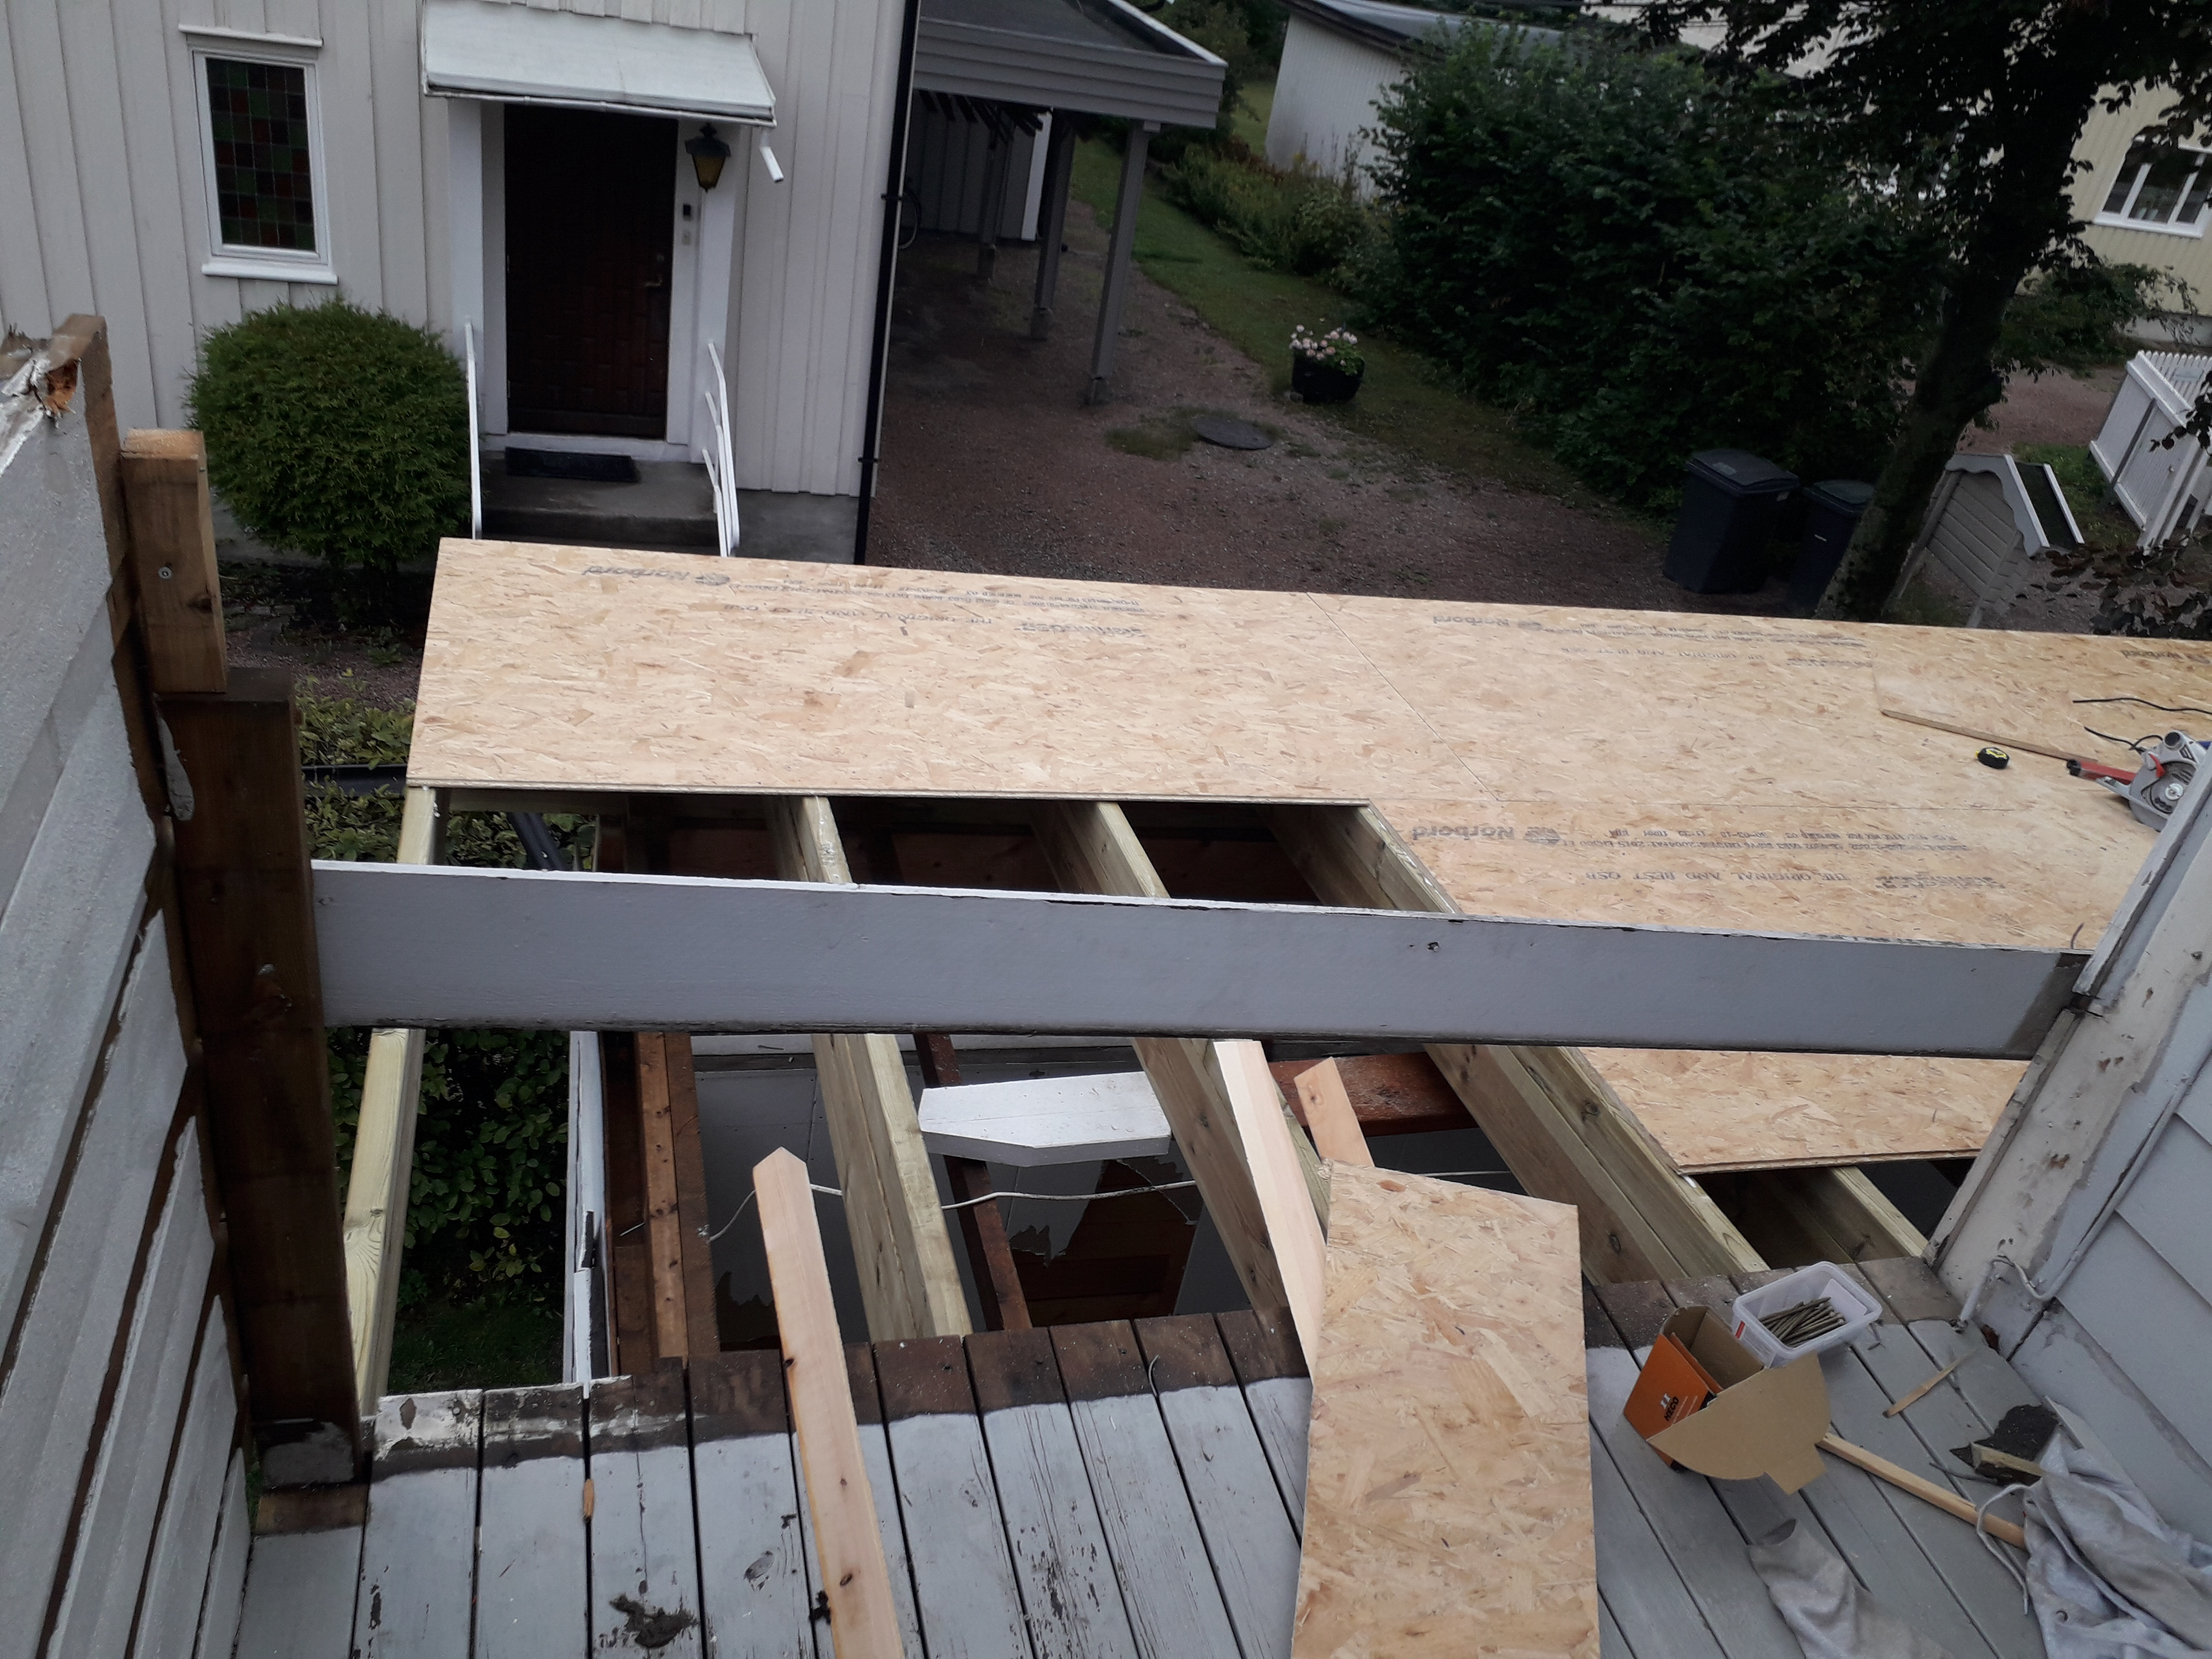 tak terrasse med pappmembran 3